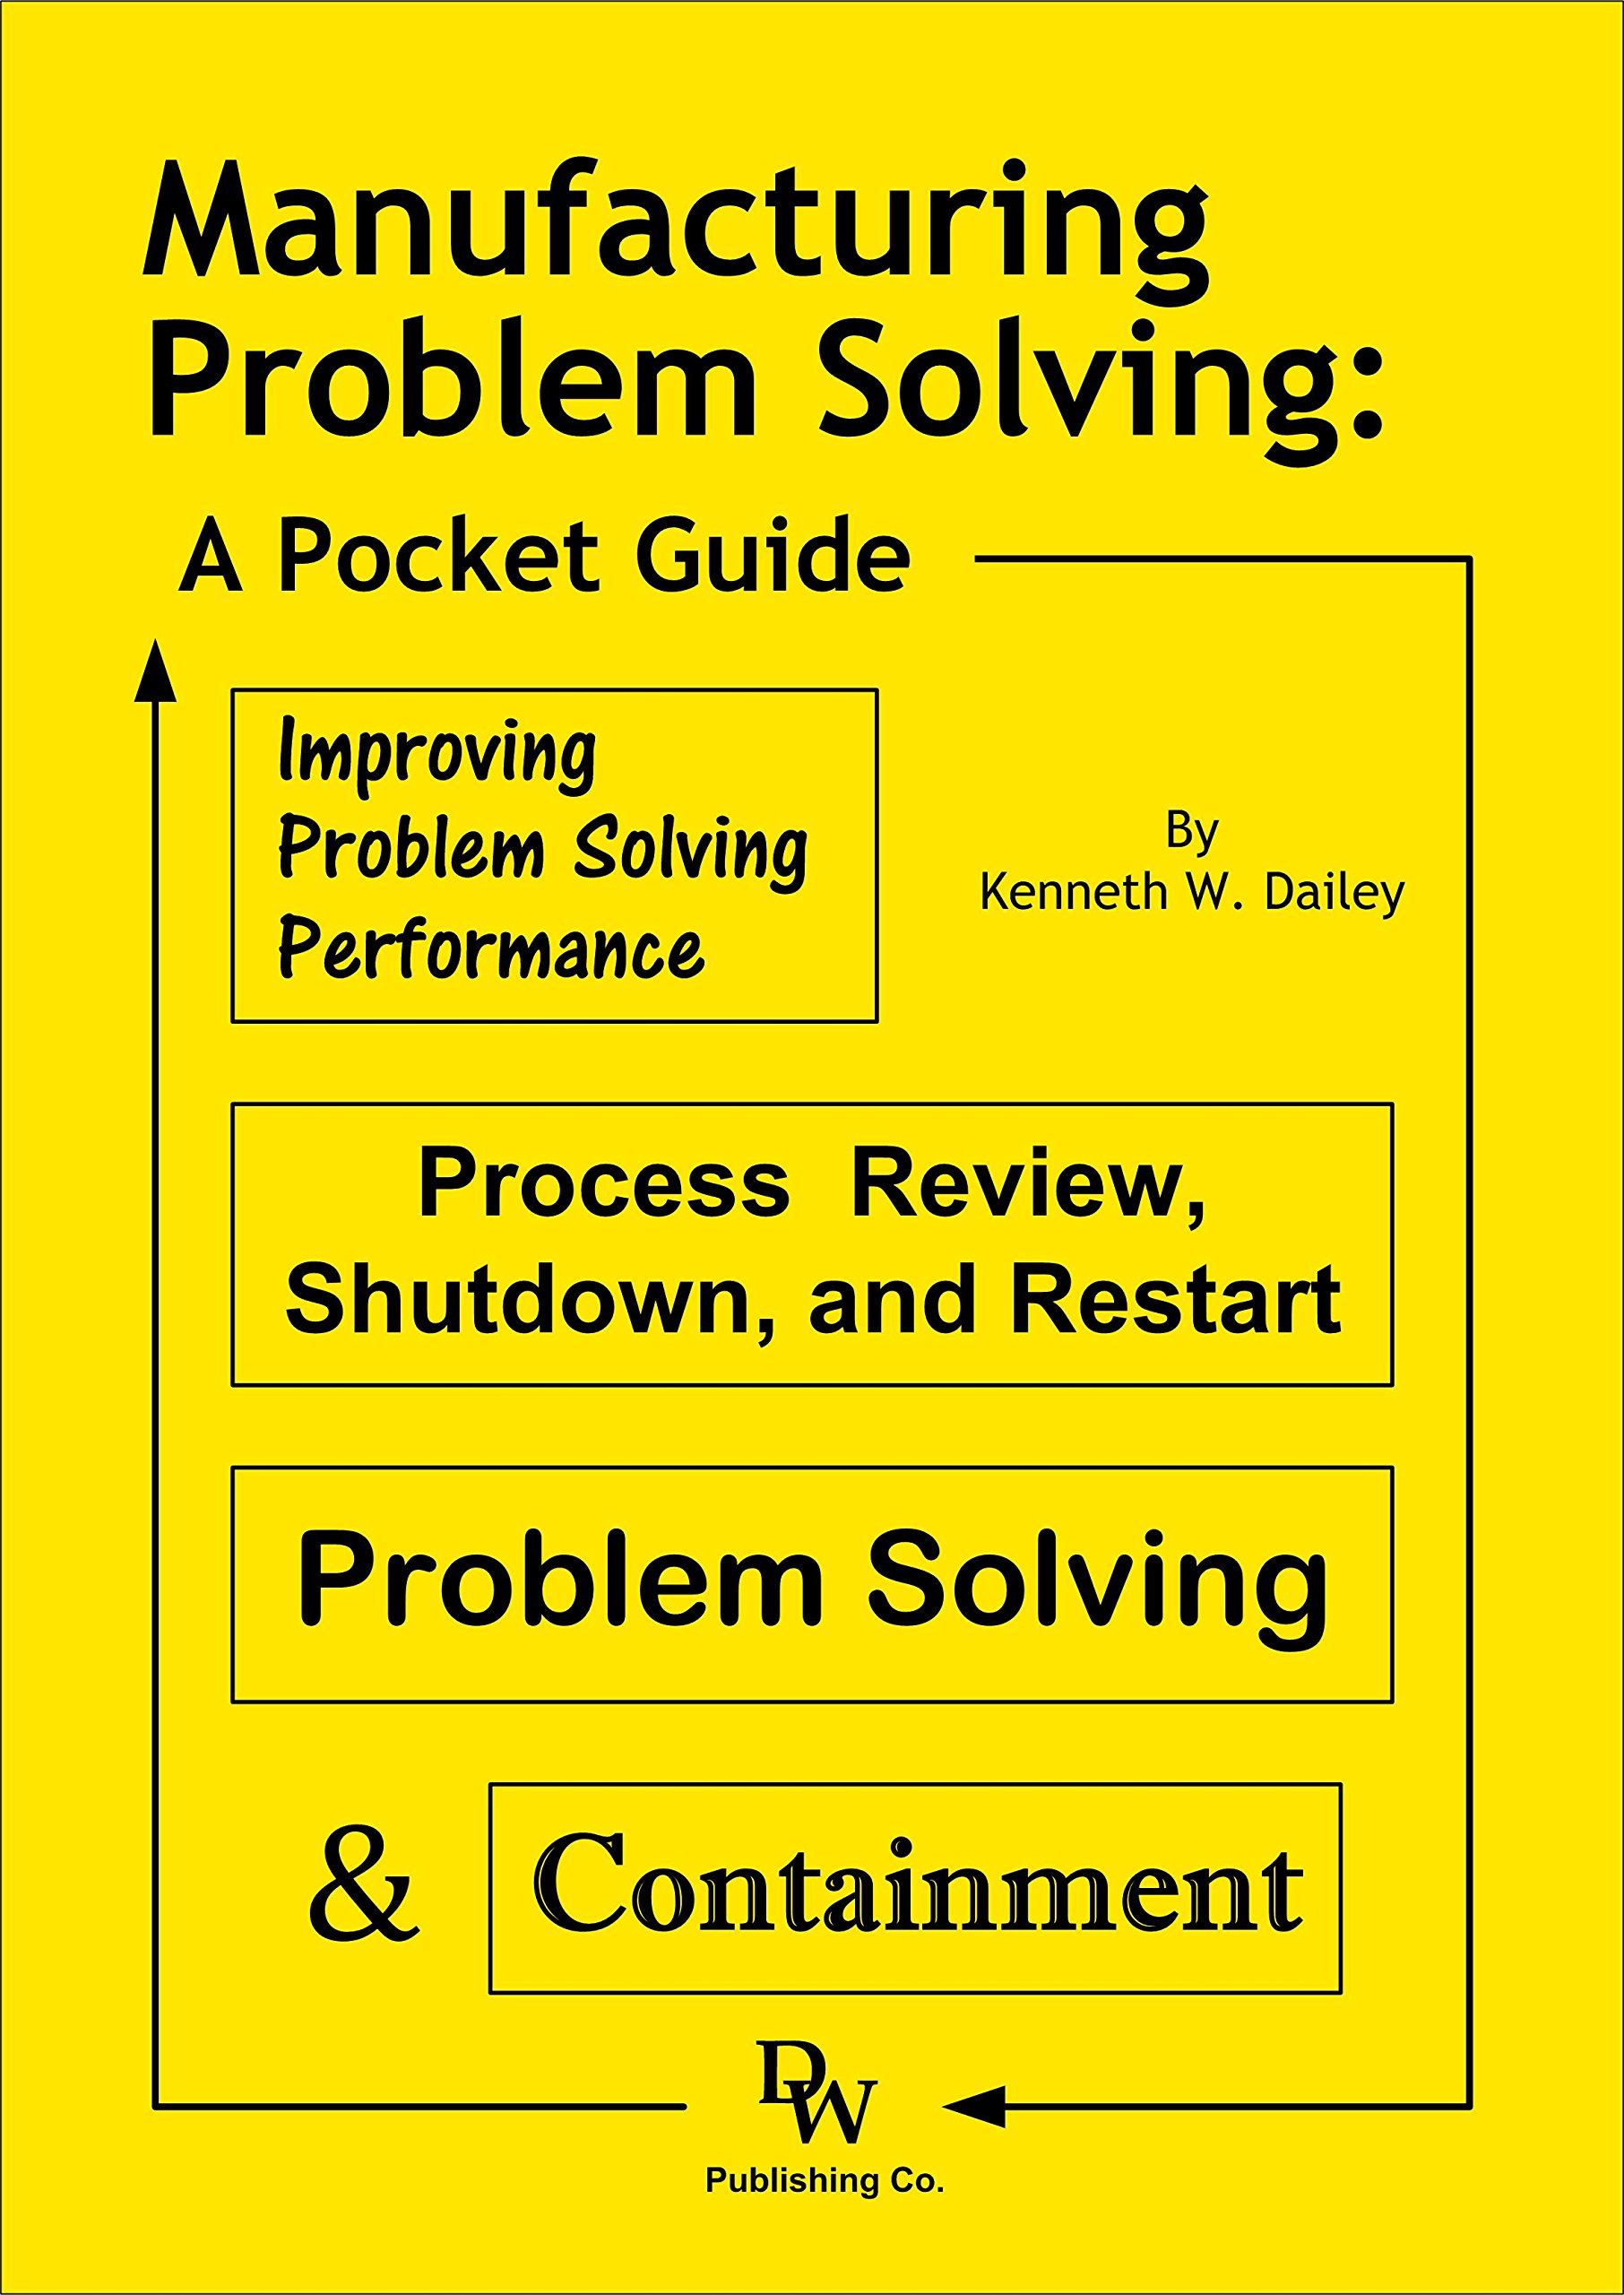 Manufacturing Problem Solving: A Pocket Guide pdf